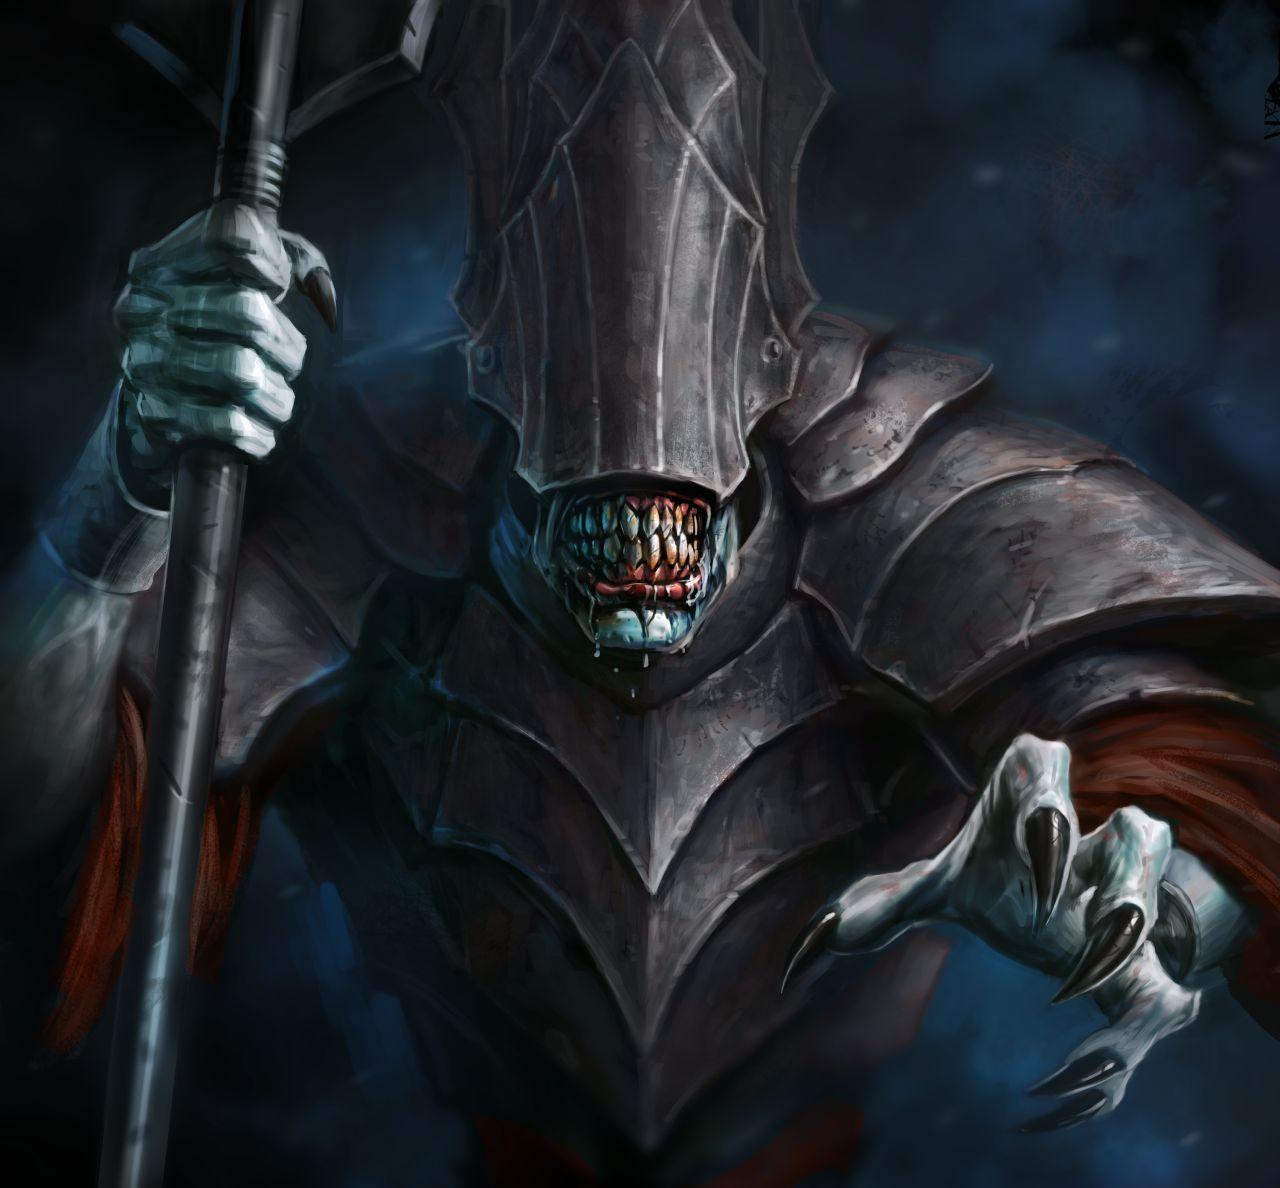 Alfa img - Showing > The Hobbit 3 Sauron Wallpaper Necromancer Hobbit Desolation Of Smaug